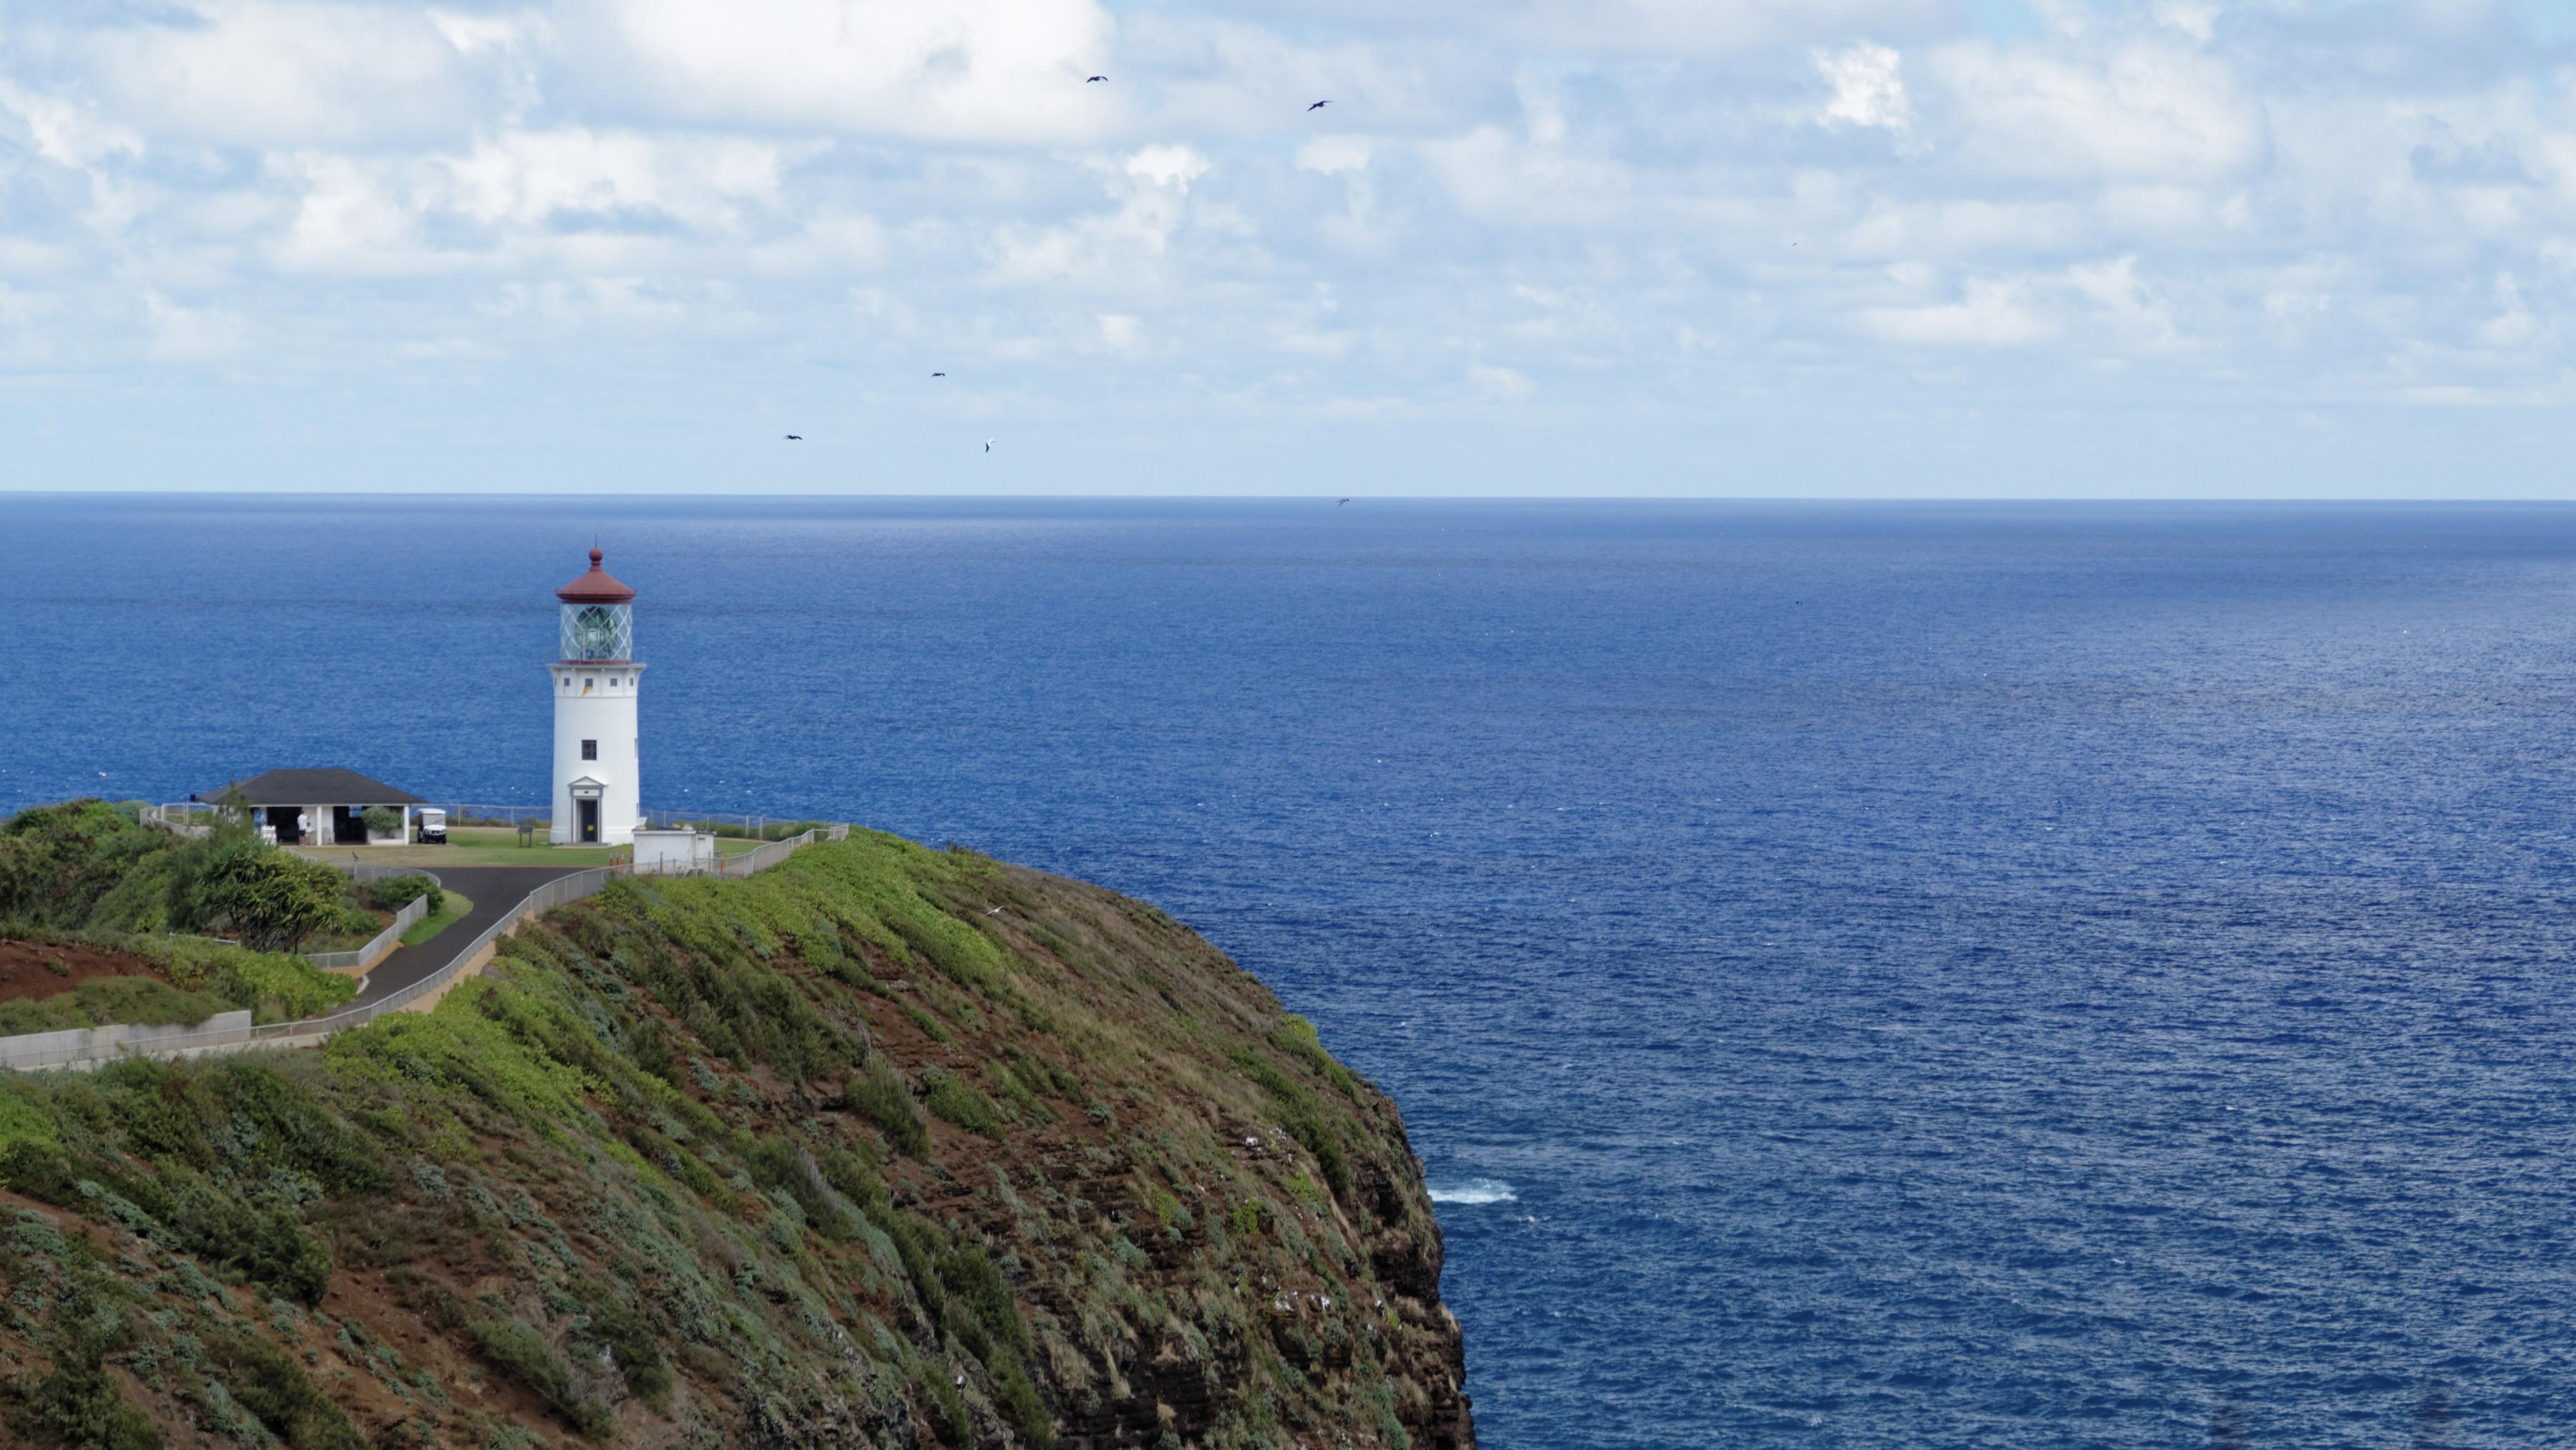 Le phare de Kilauea, au nord de Kauai